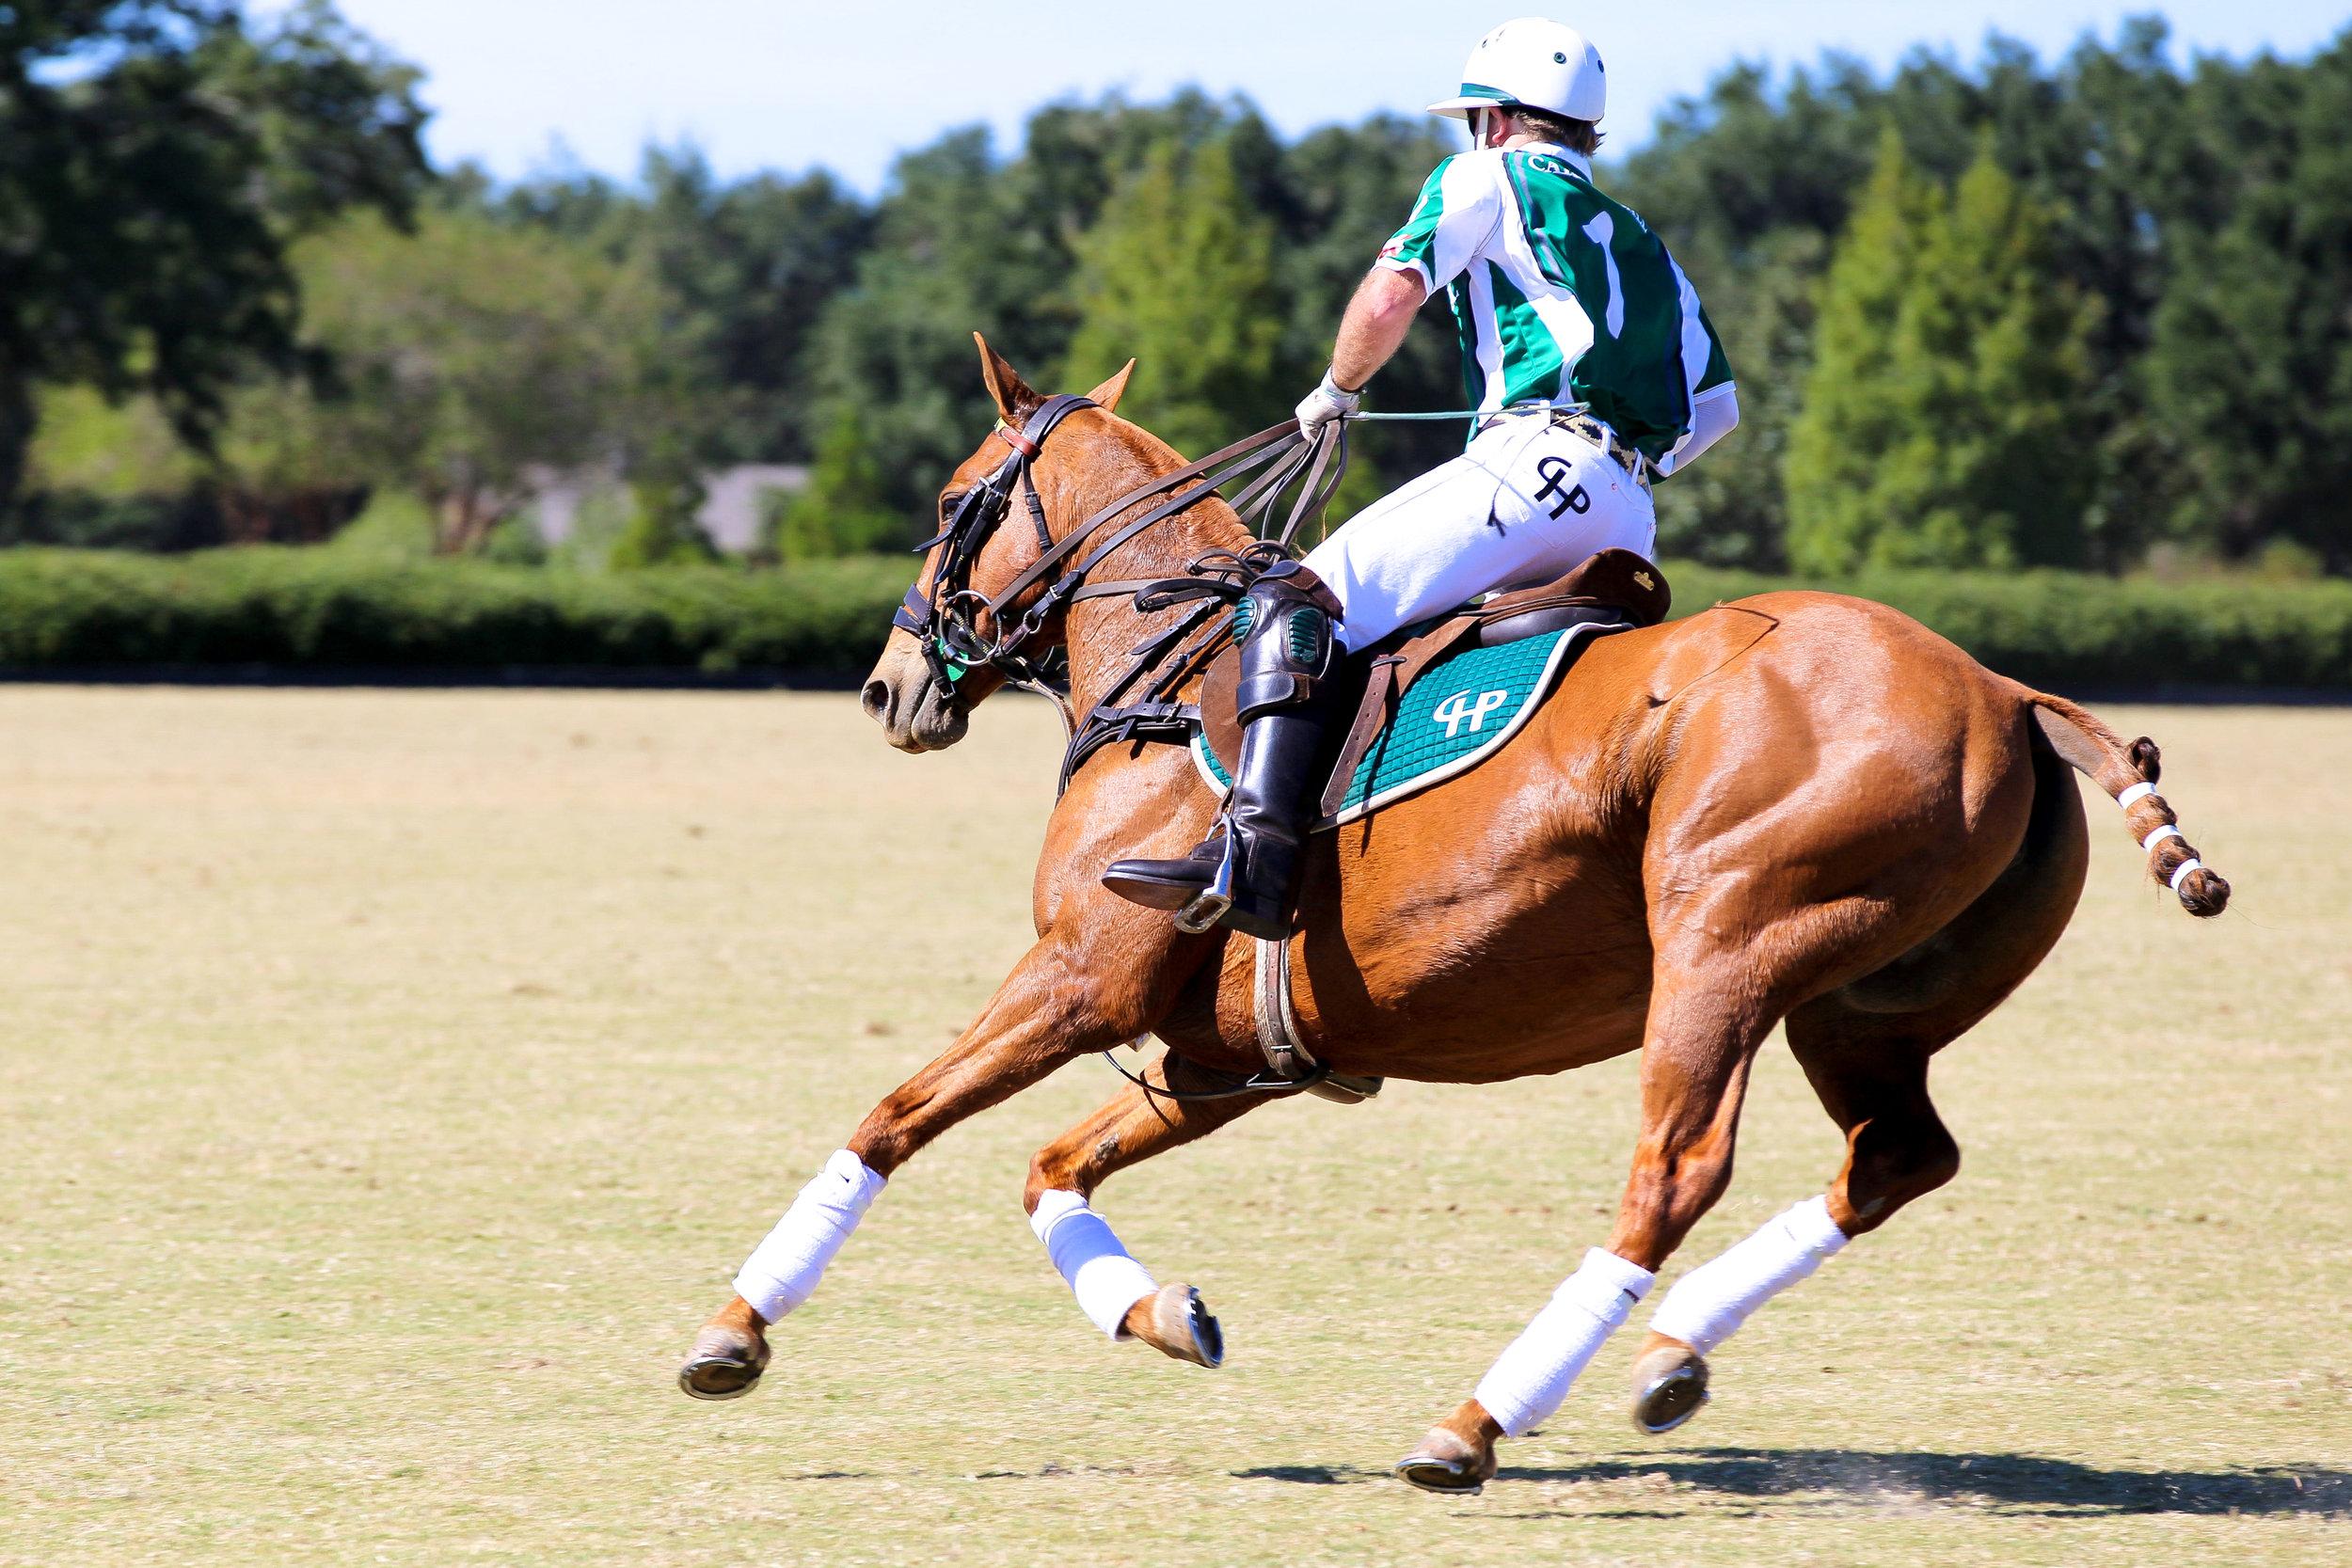 fashion blogger lcb style horse polo fall fashion (6 of 7).jpg